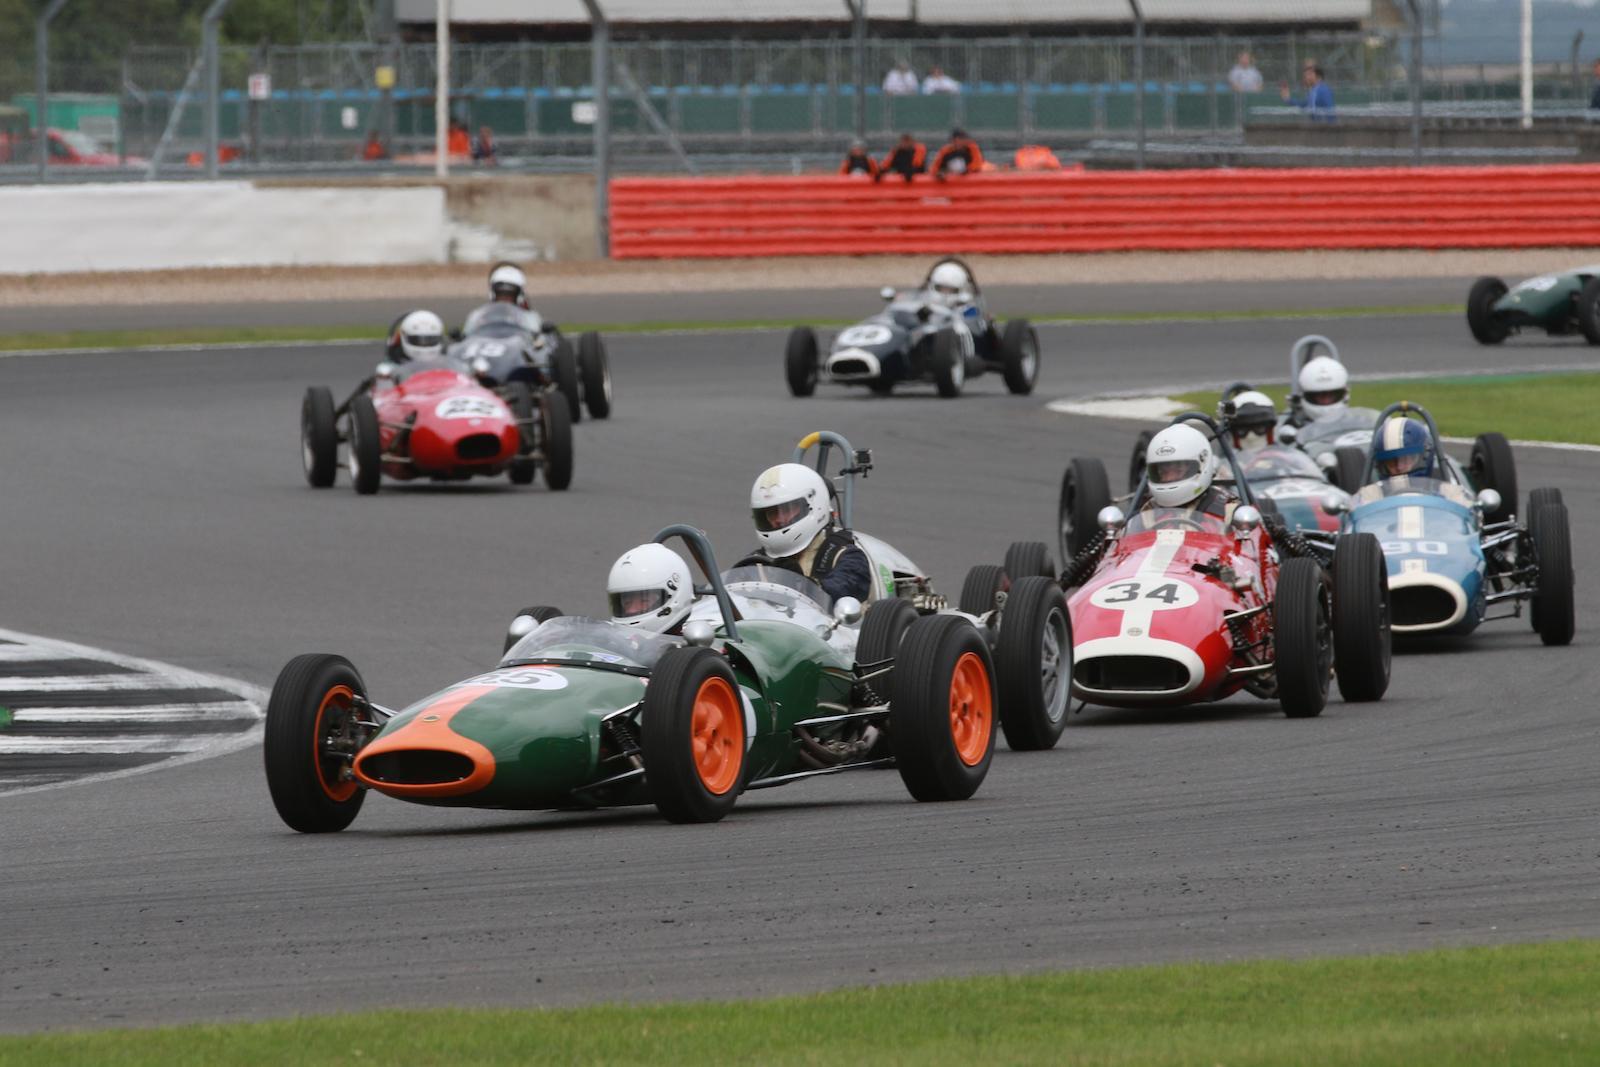 Historic Motorsport Round-up: Formula Junior diamond jubilee